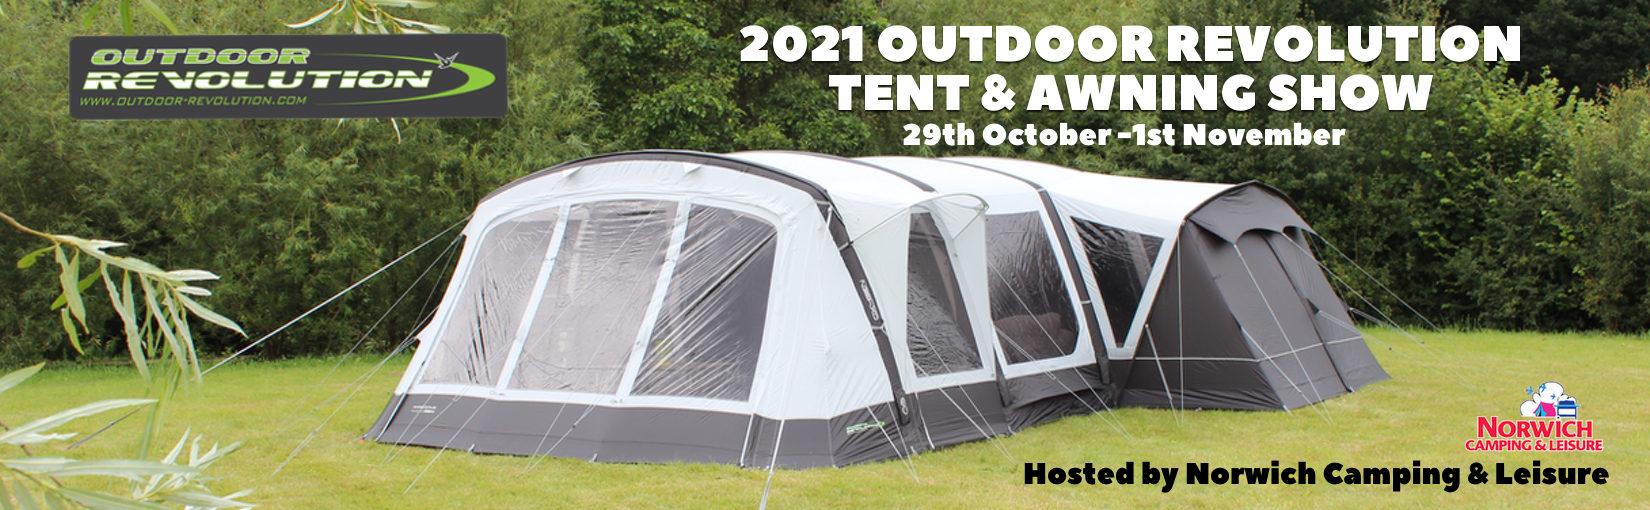 Outdoor Rev 2021 Show Web Banner 1650X510